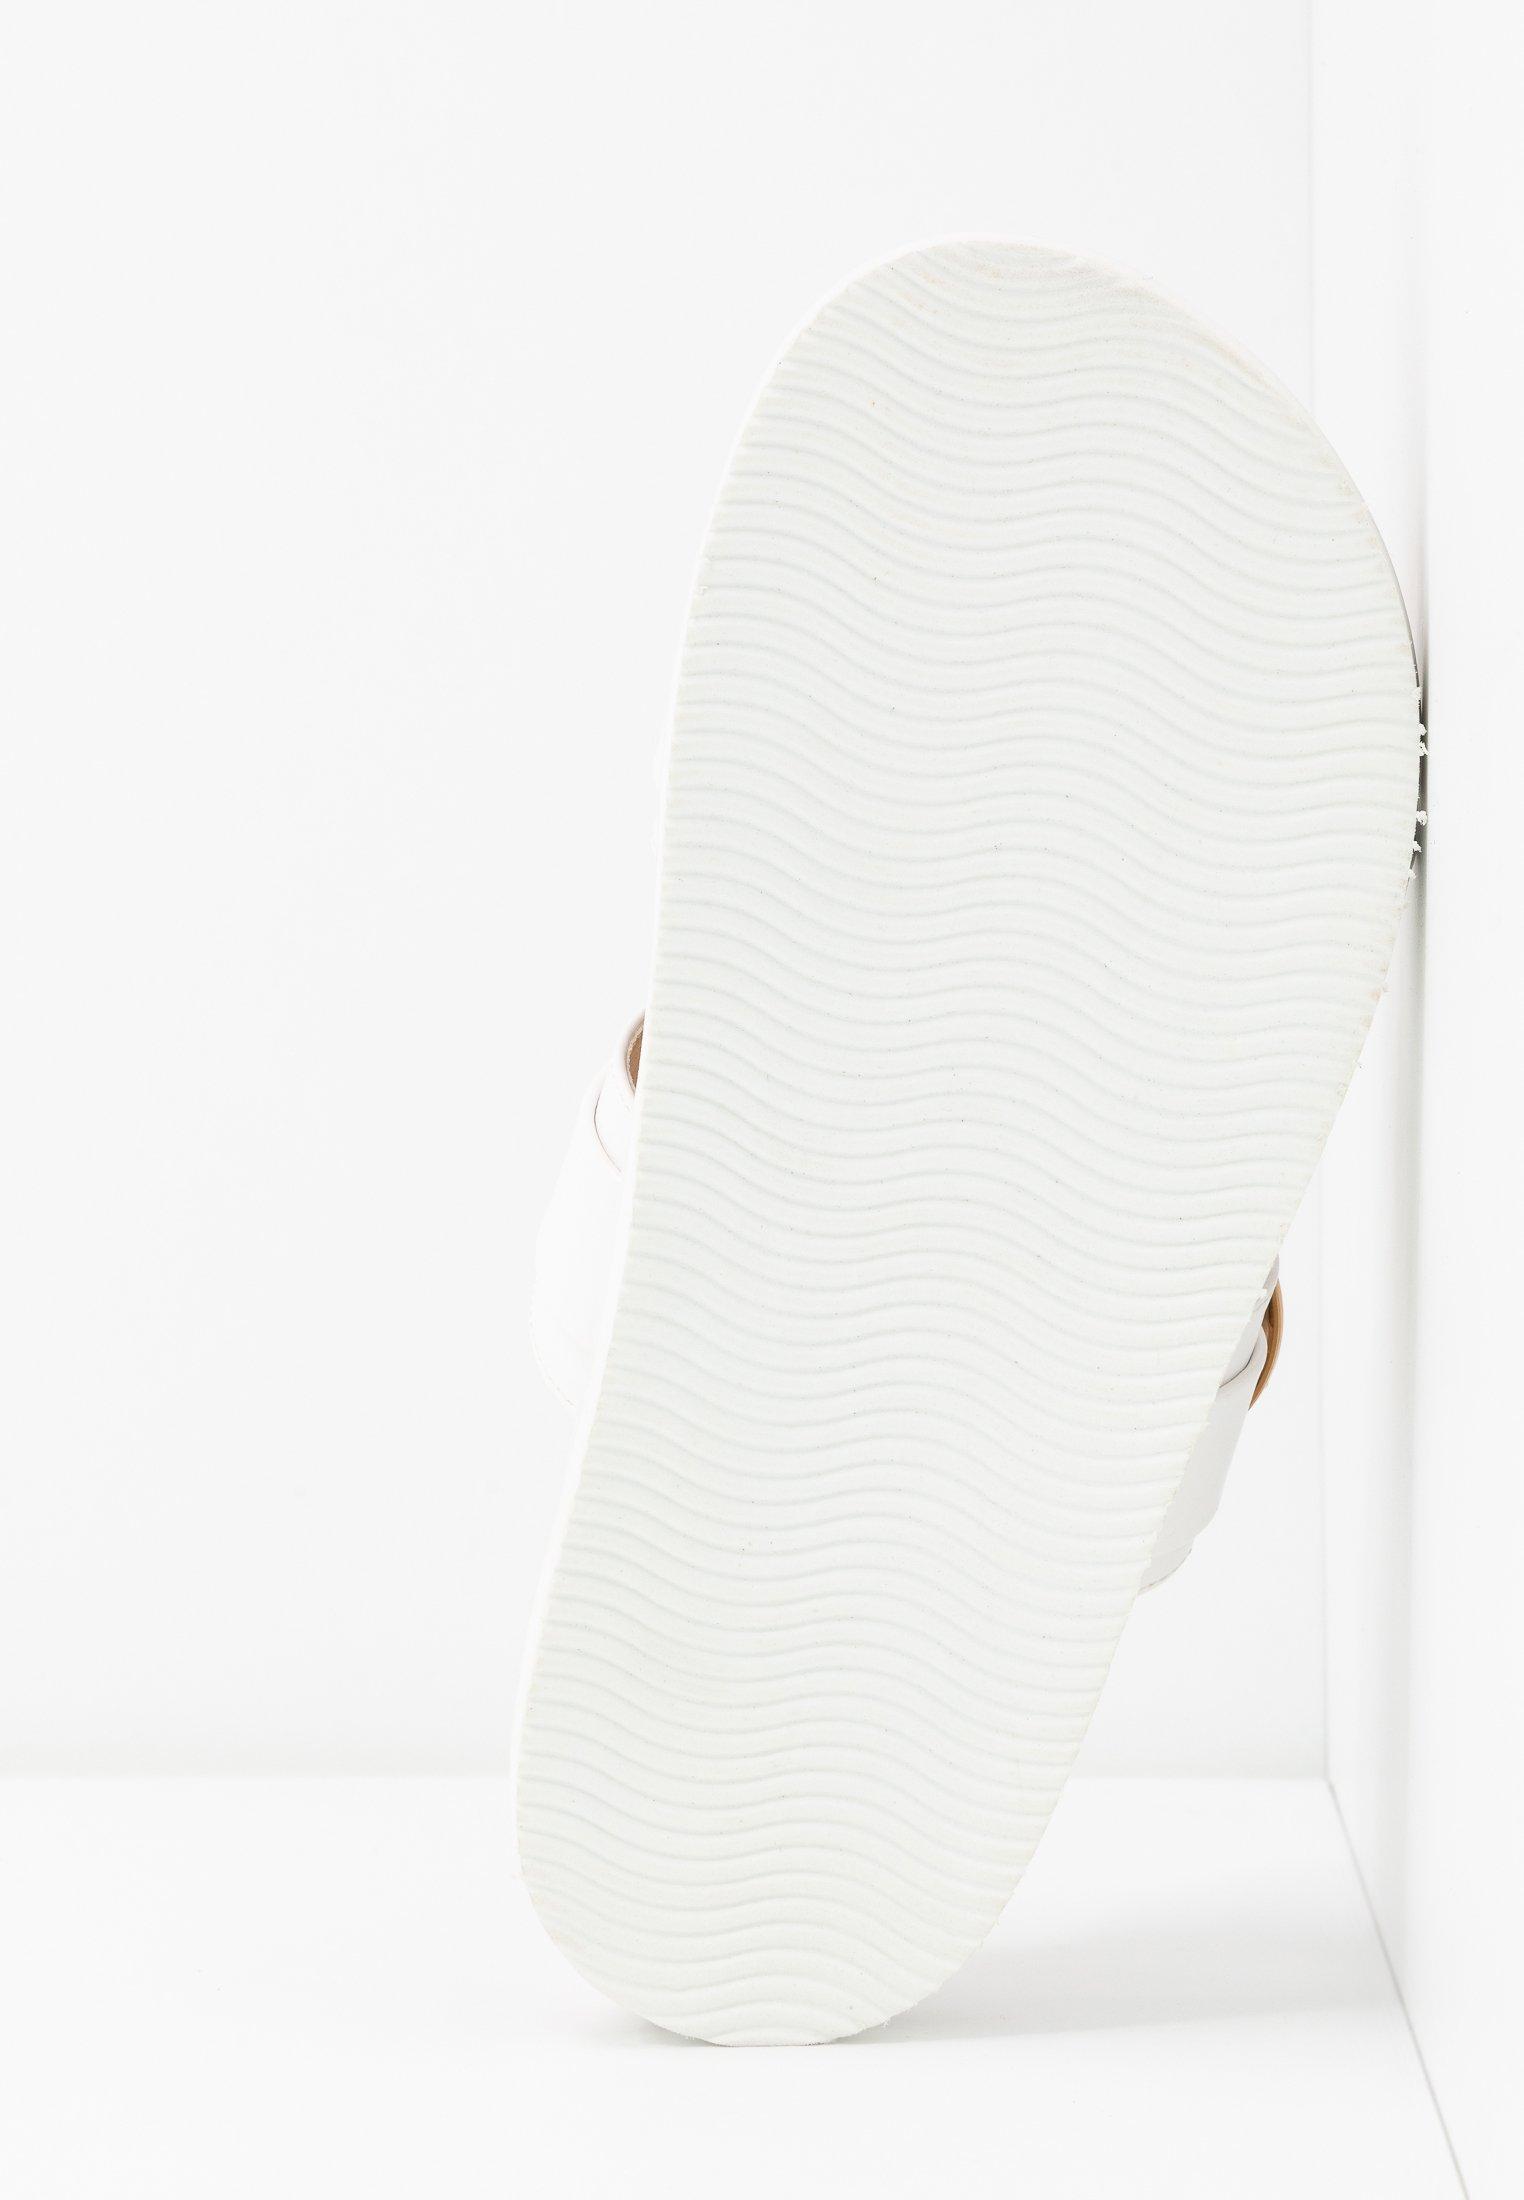 4th & Reckless RAE - Ciabattine white